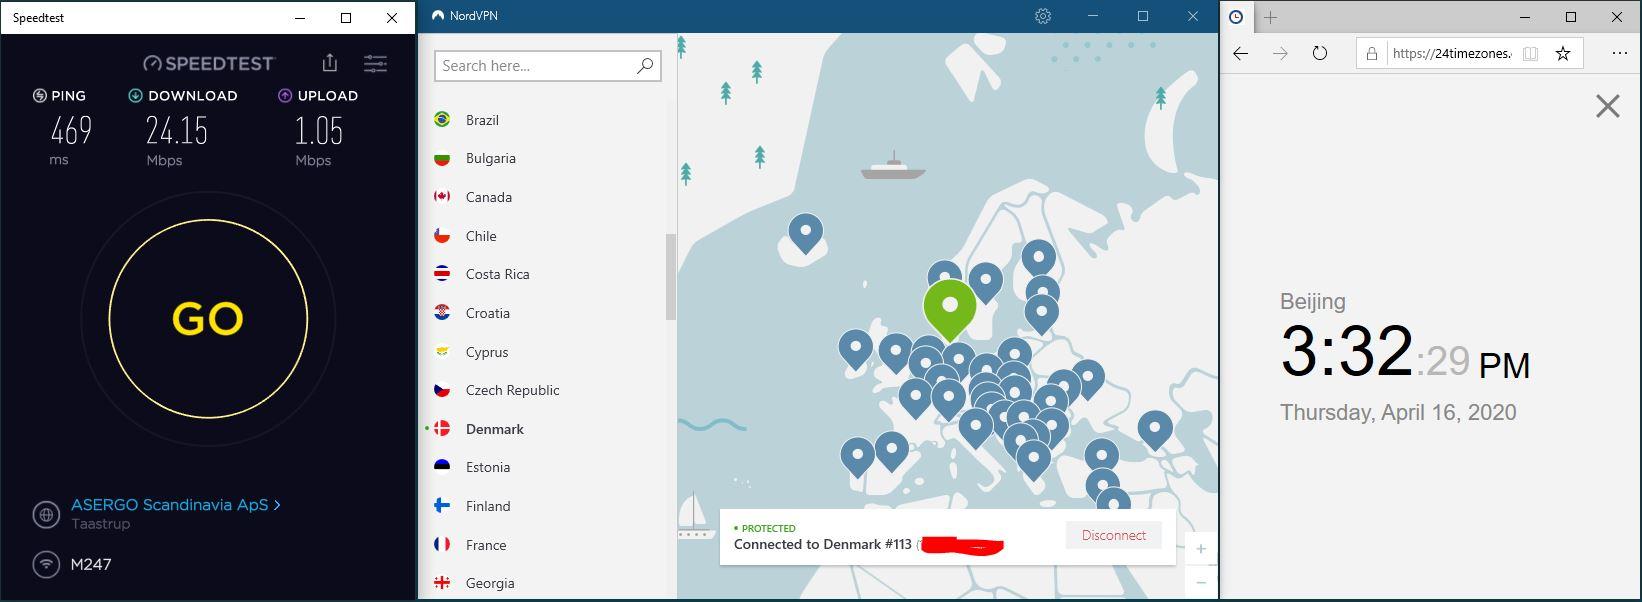 Windows10 NordVPN Denmark #113 中国VPN 翻墙 科学上网 SpeedTest测速-20200416